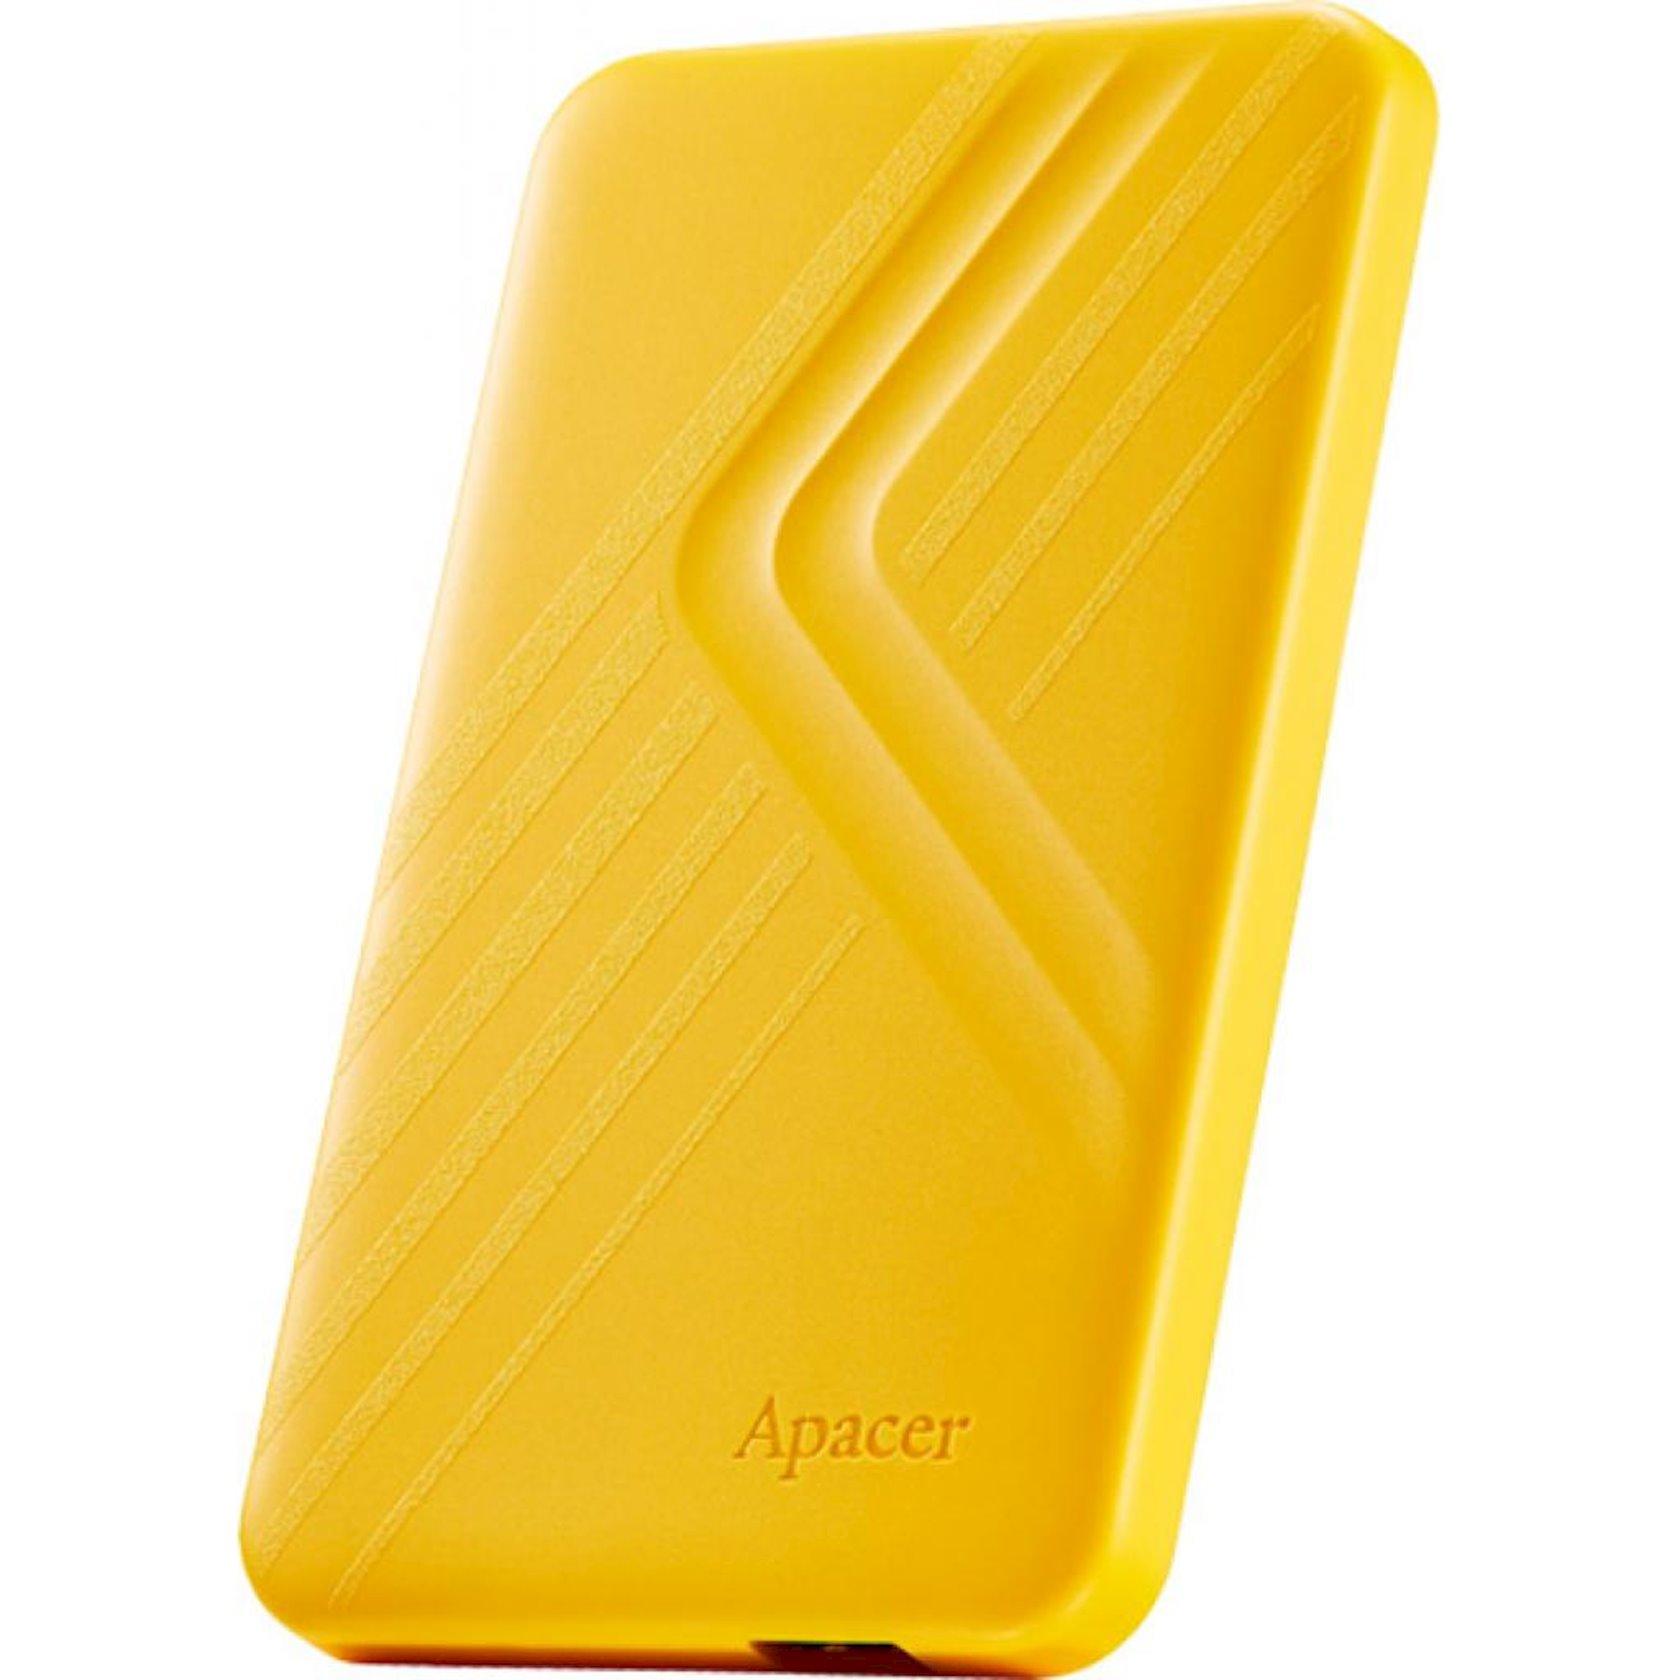 Xarici sərt disk Apacer 2 TB USB 3.1 Portable Hard Drive AC236 Yellow